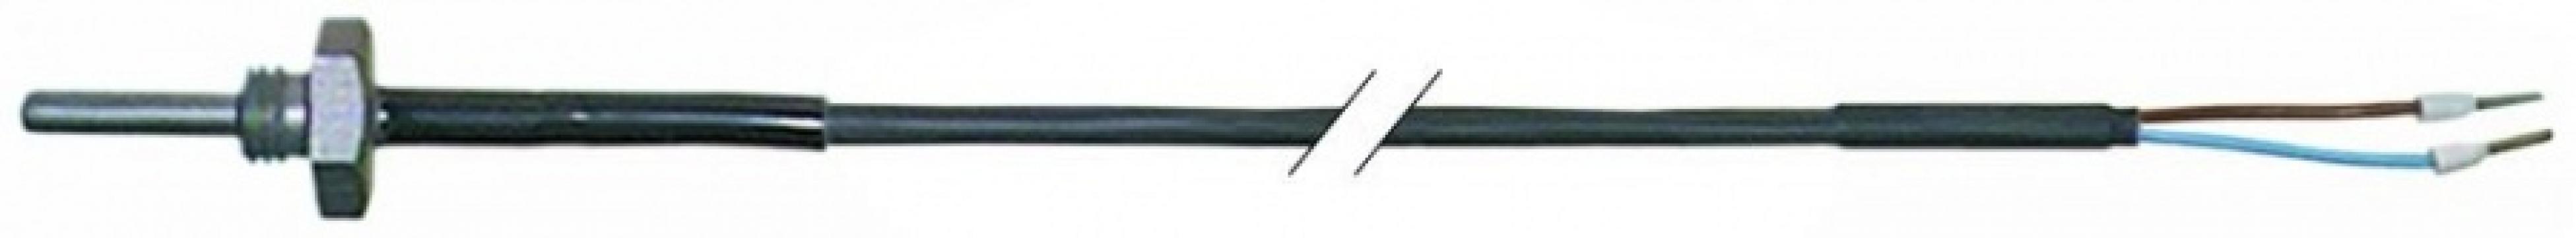 Sonda de temperatura Pt10 cablu silicon